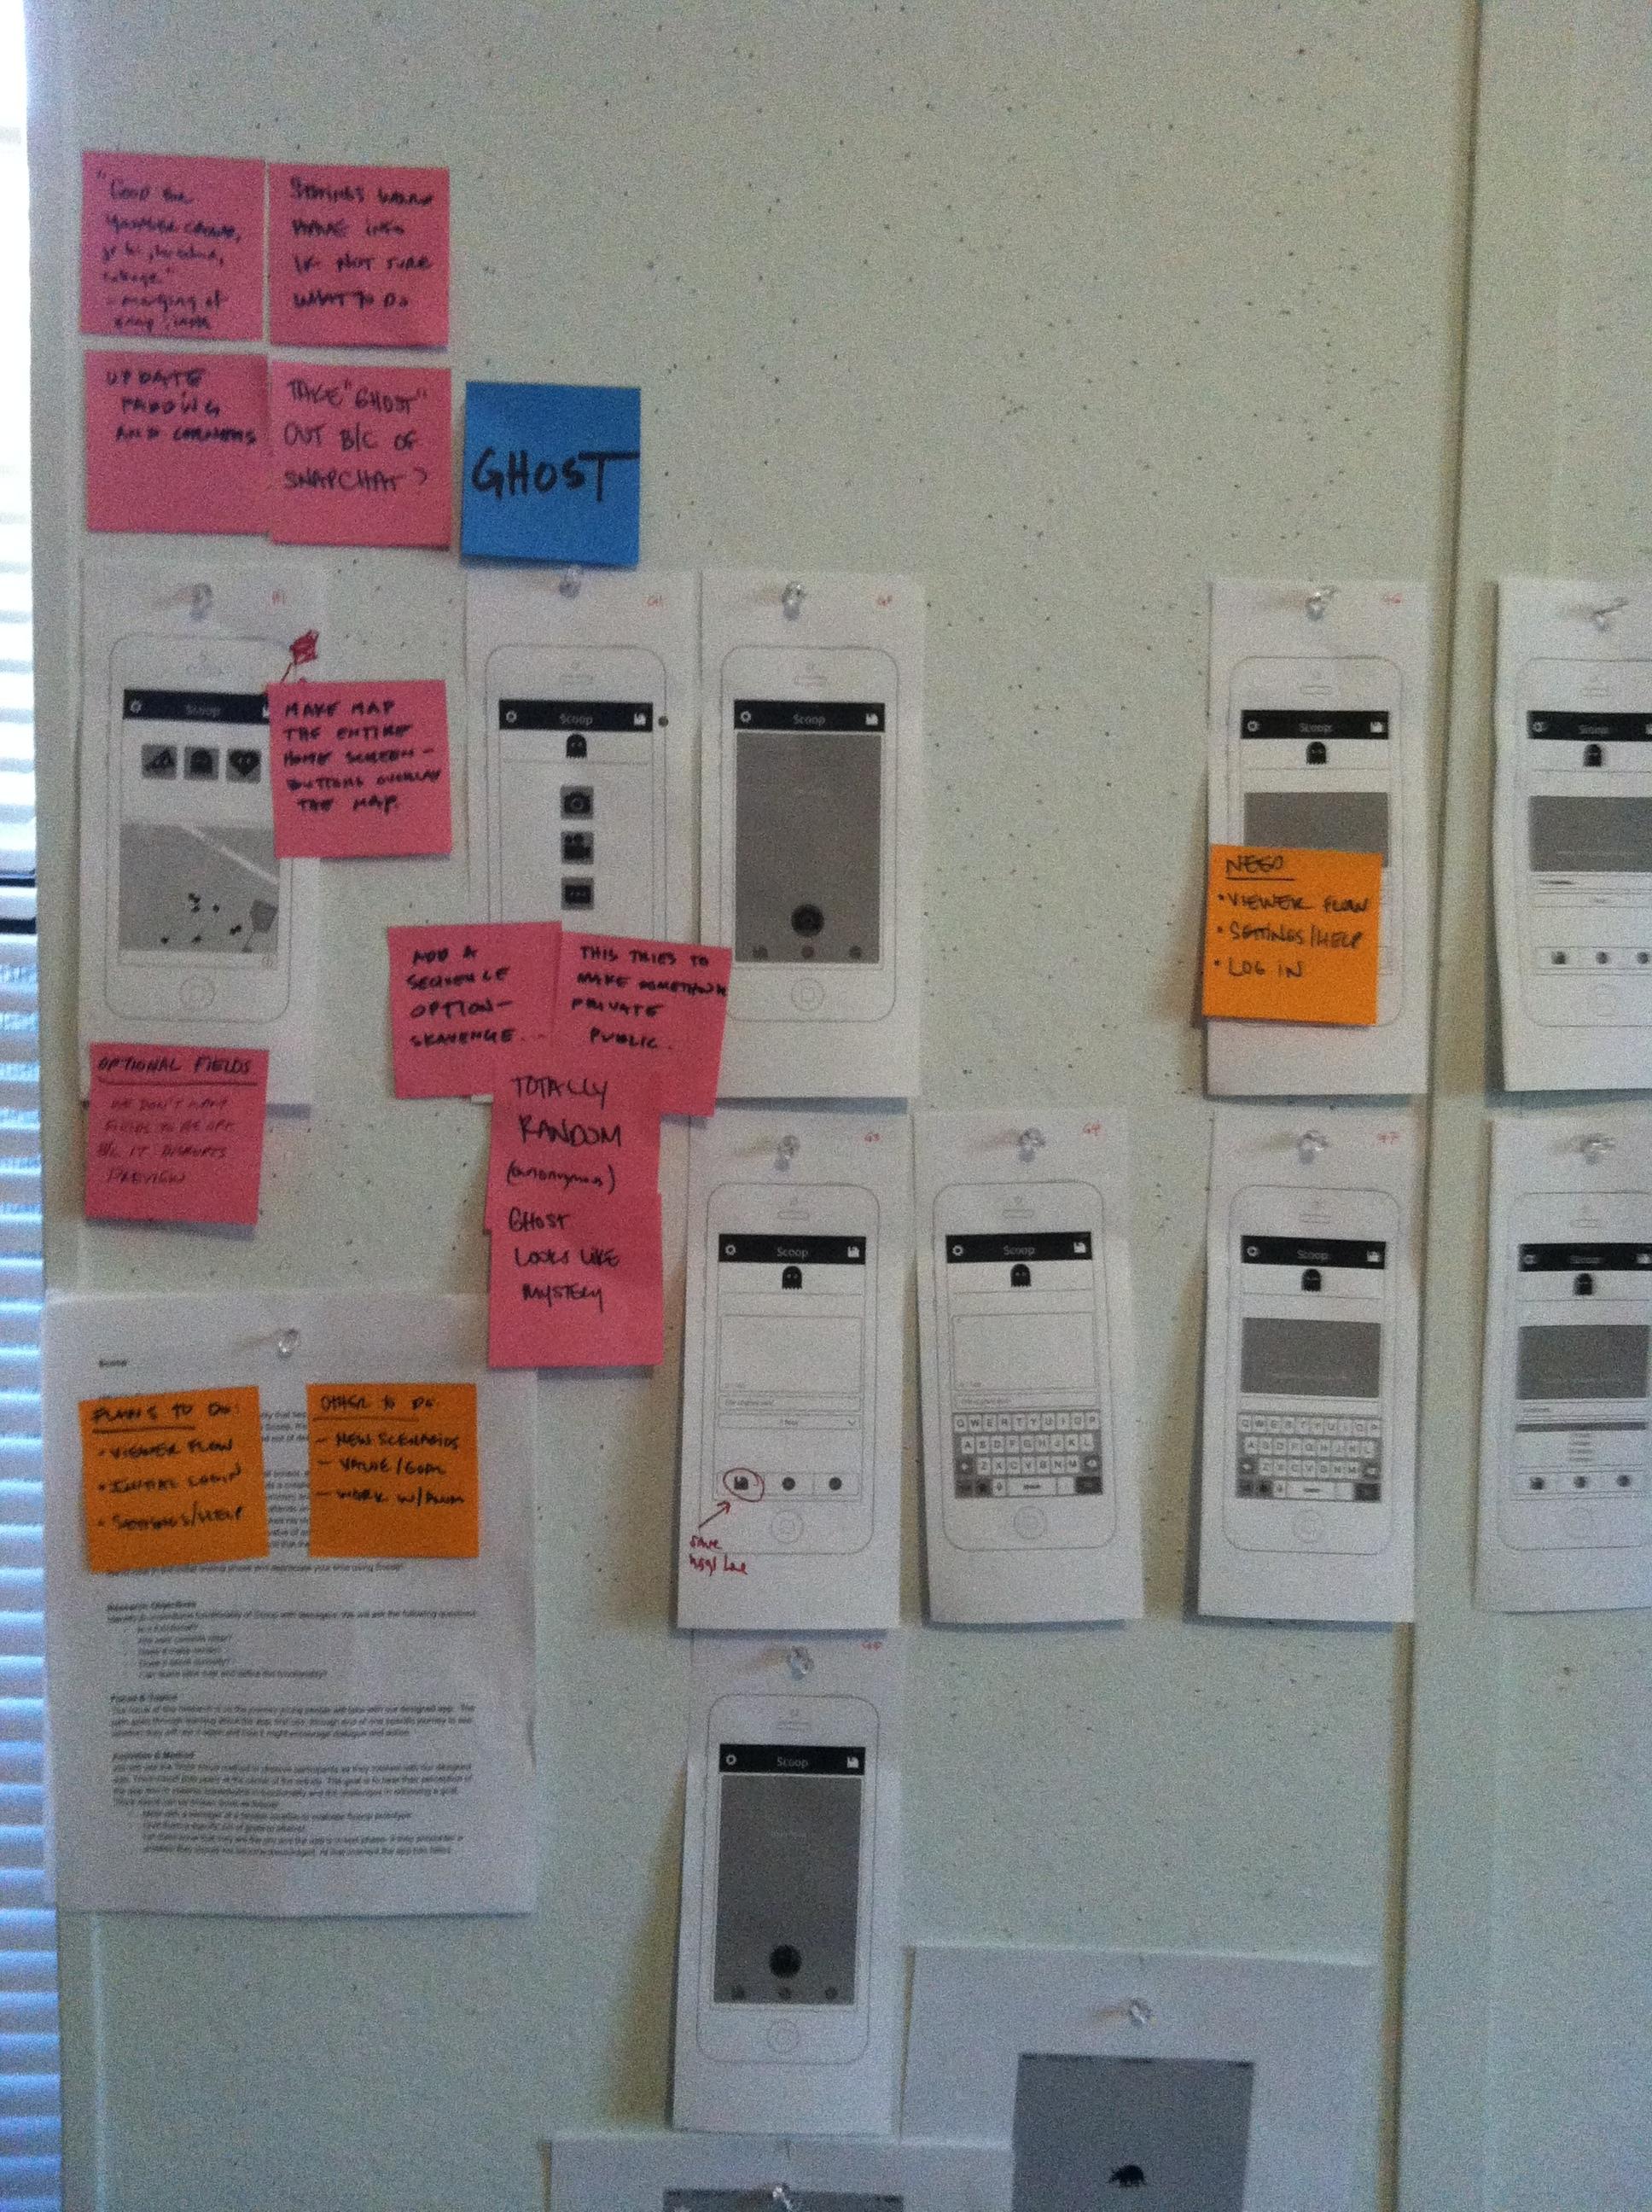 Evaluating User Flows